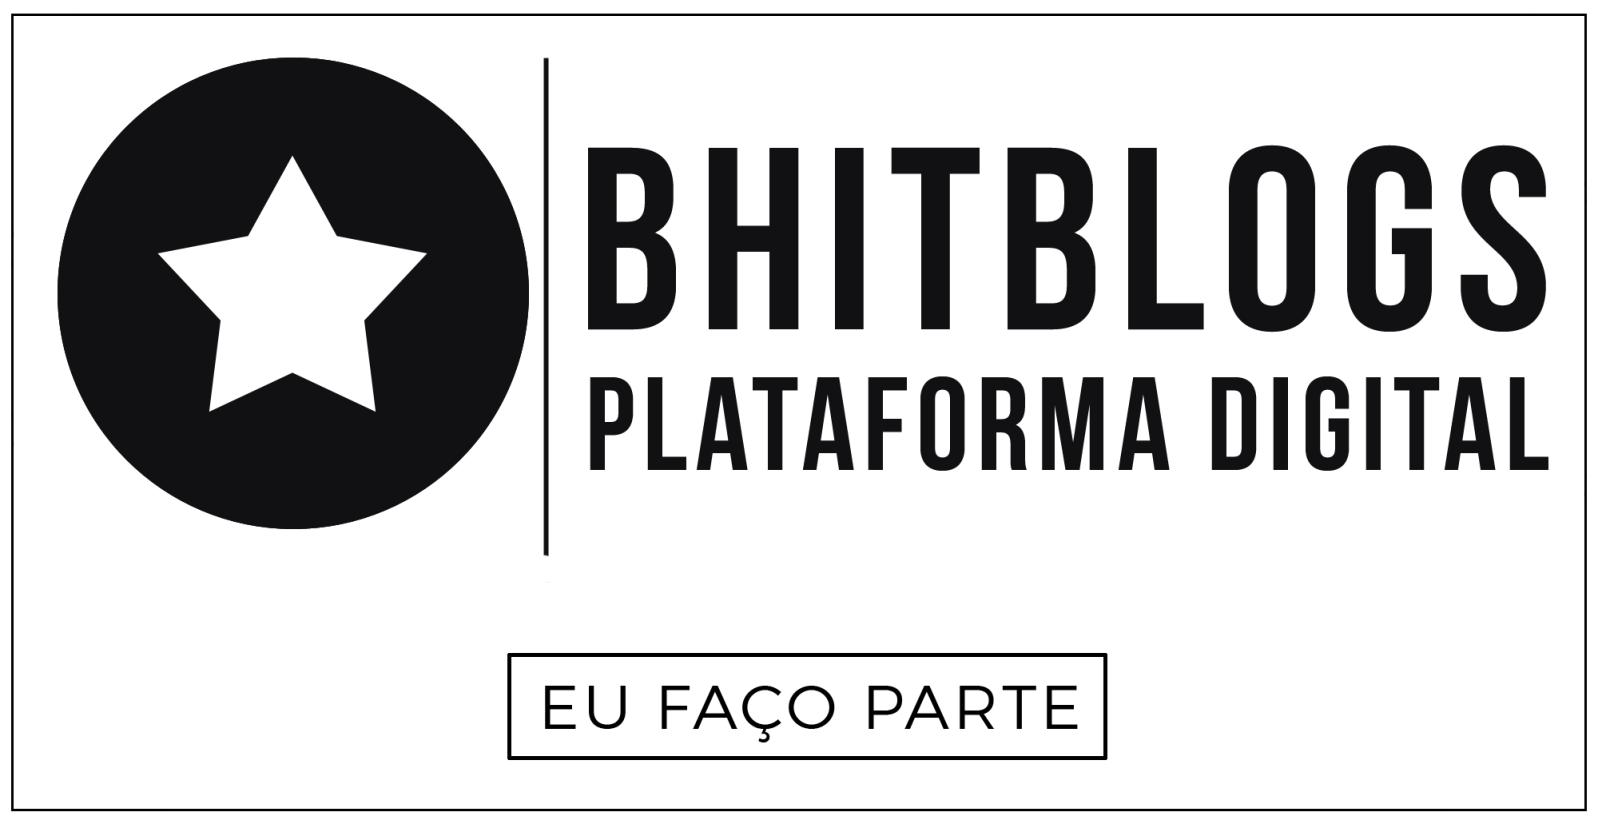 BHITBLOGS